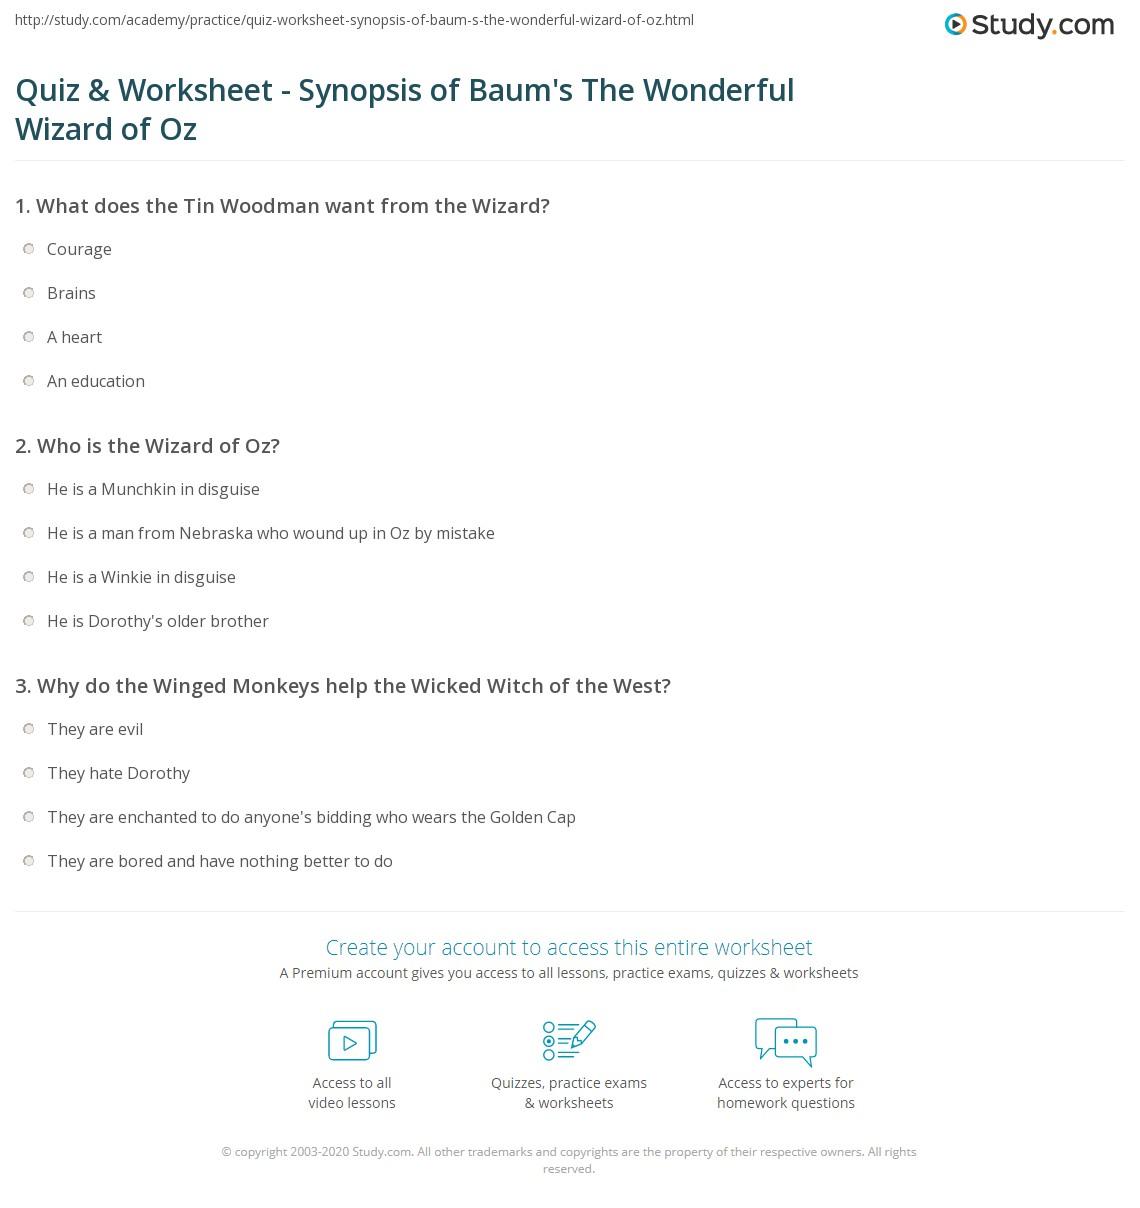 Quiz & Worksheet - Synopsis of Baum\'s The Wonderful Wizard of Oz ...